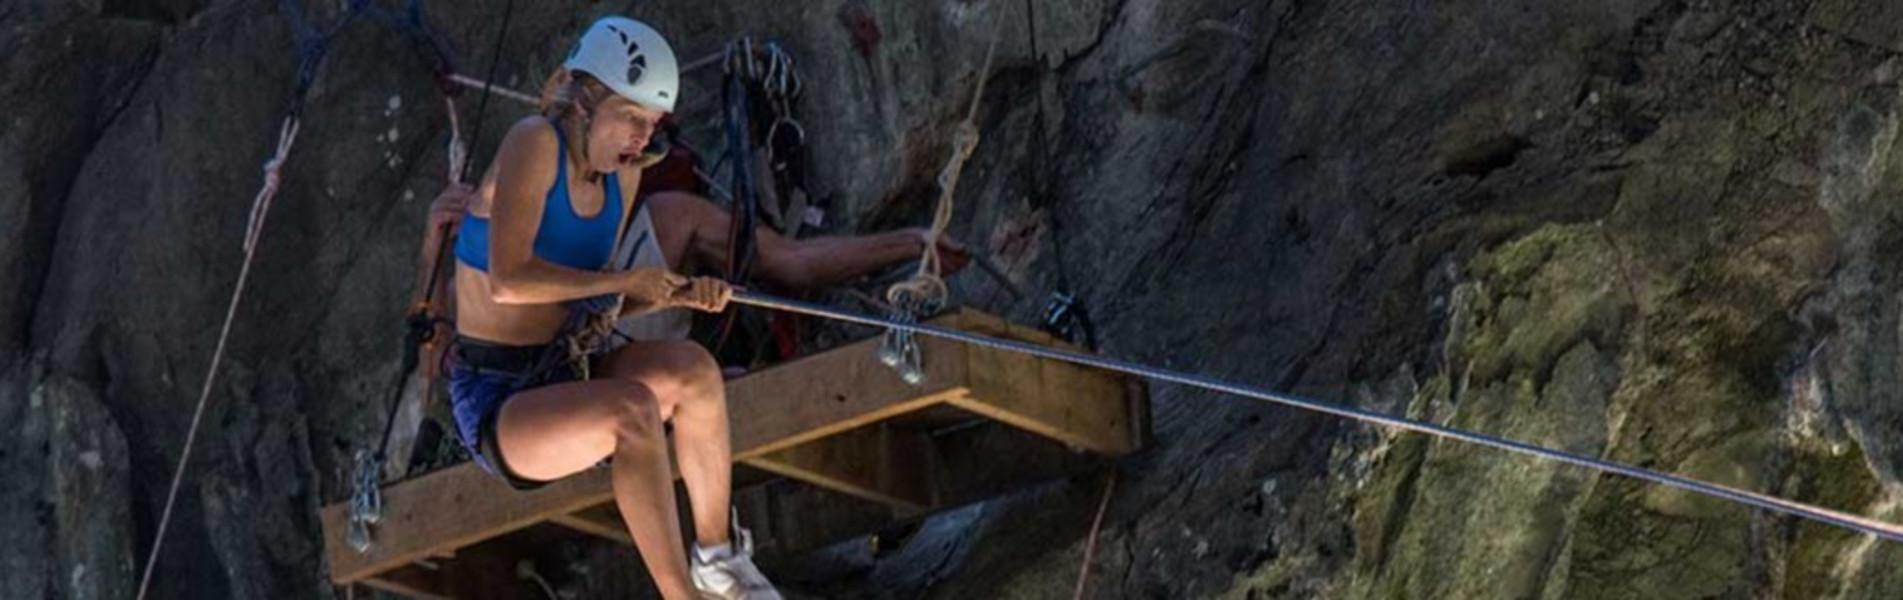 Extreme Zipline Adventure in Krabi (Half-day)